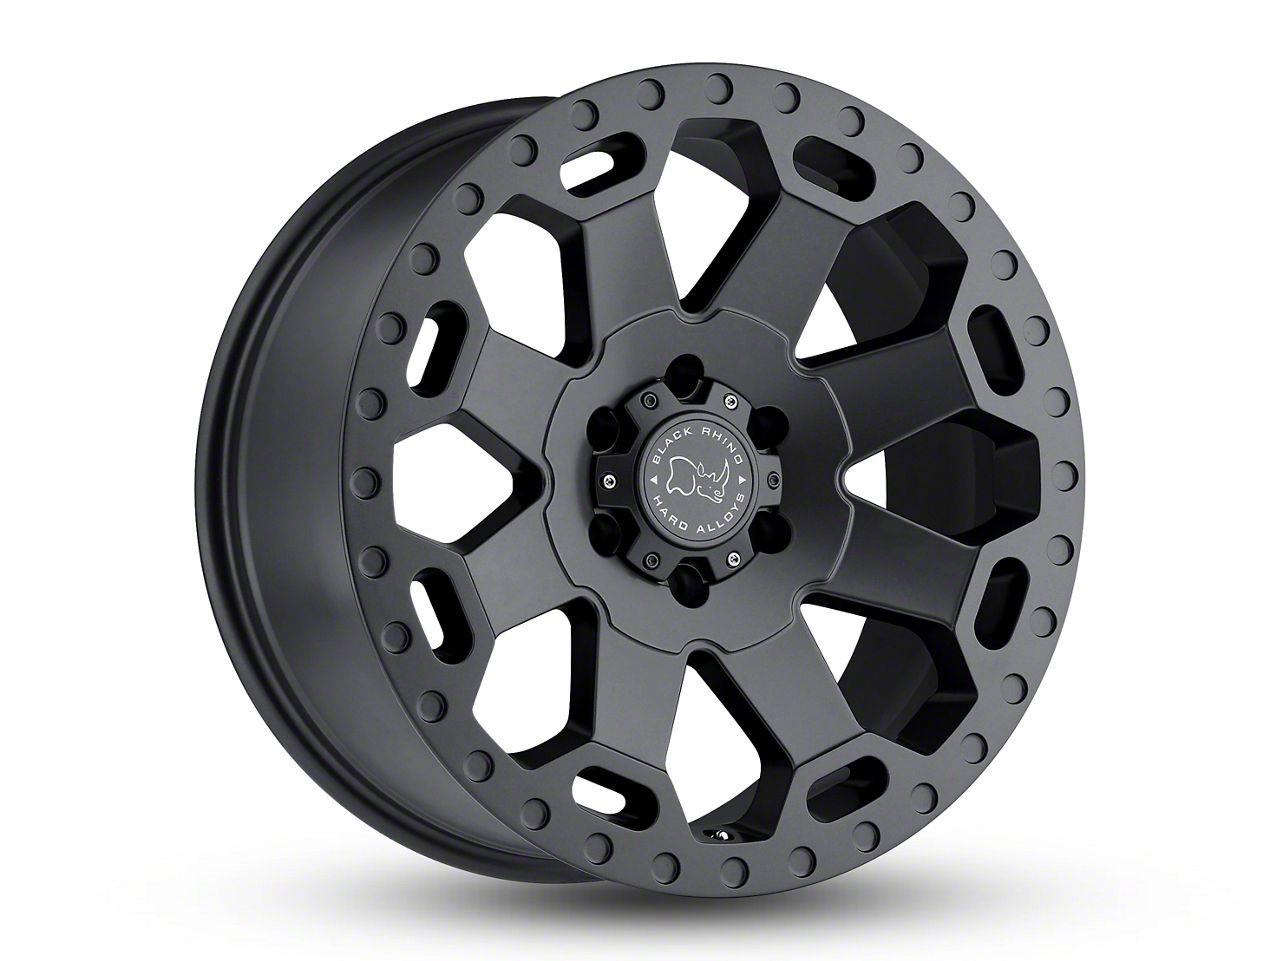 Black Rhino Warlord Matte Gunmetal 6-Lug Wheel - 18x9 (07-18 Sierra 1500)